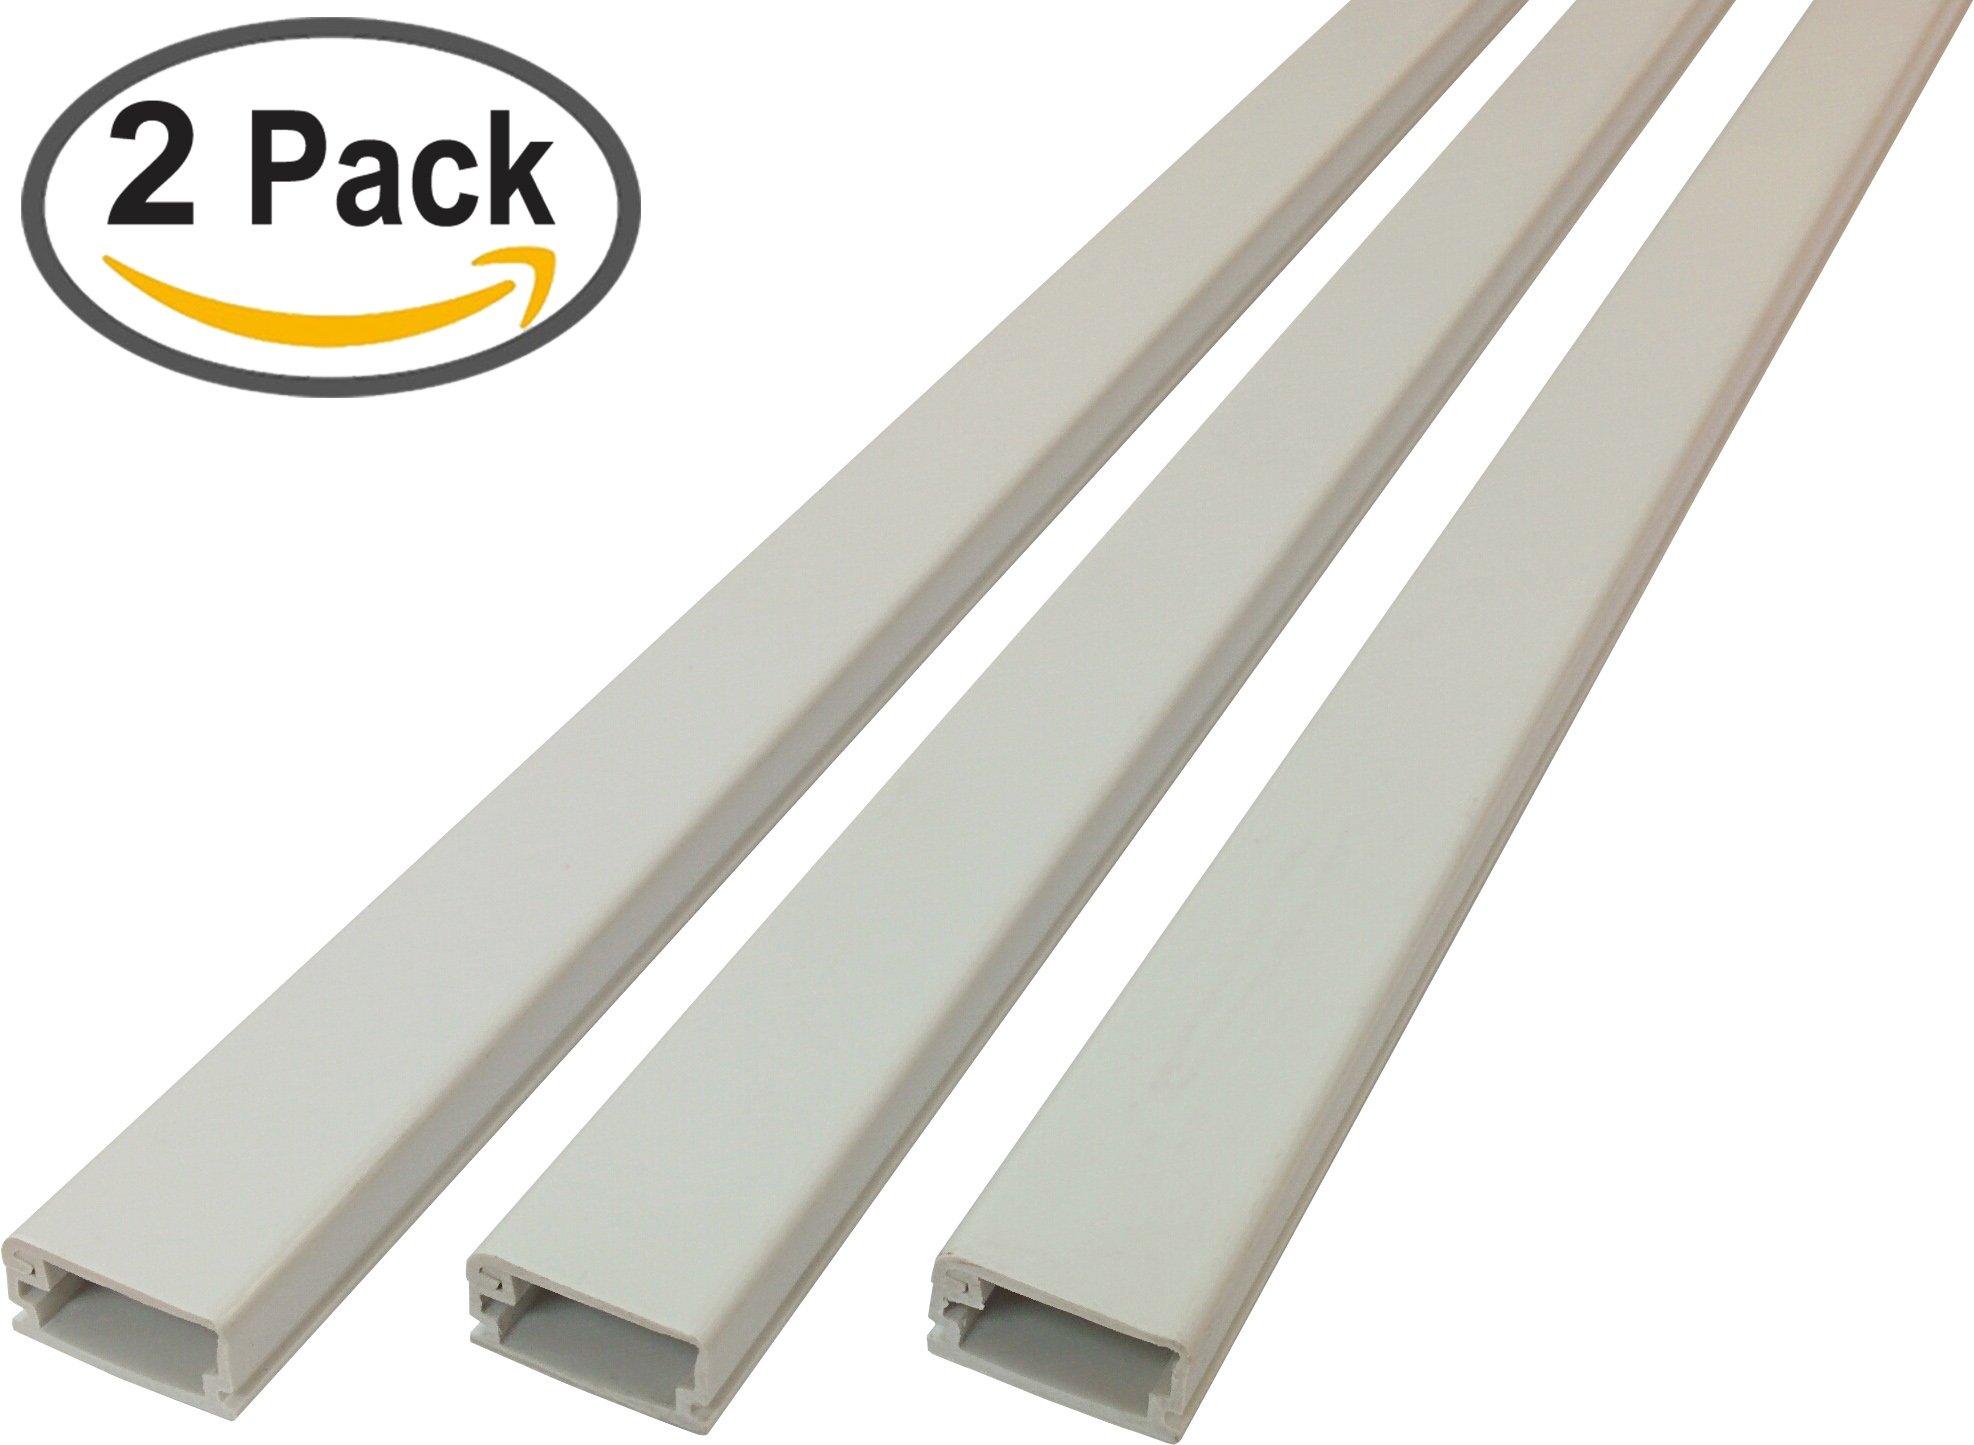 Electriduct Medium Latching Cable Raceway (500 Series) - 5 Feet - Beige   2 Sticks (10 Feet Total)